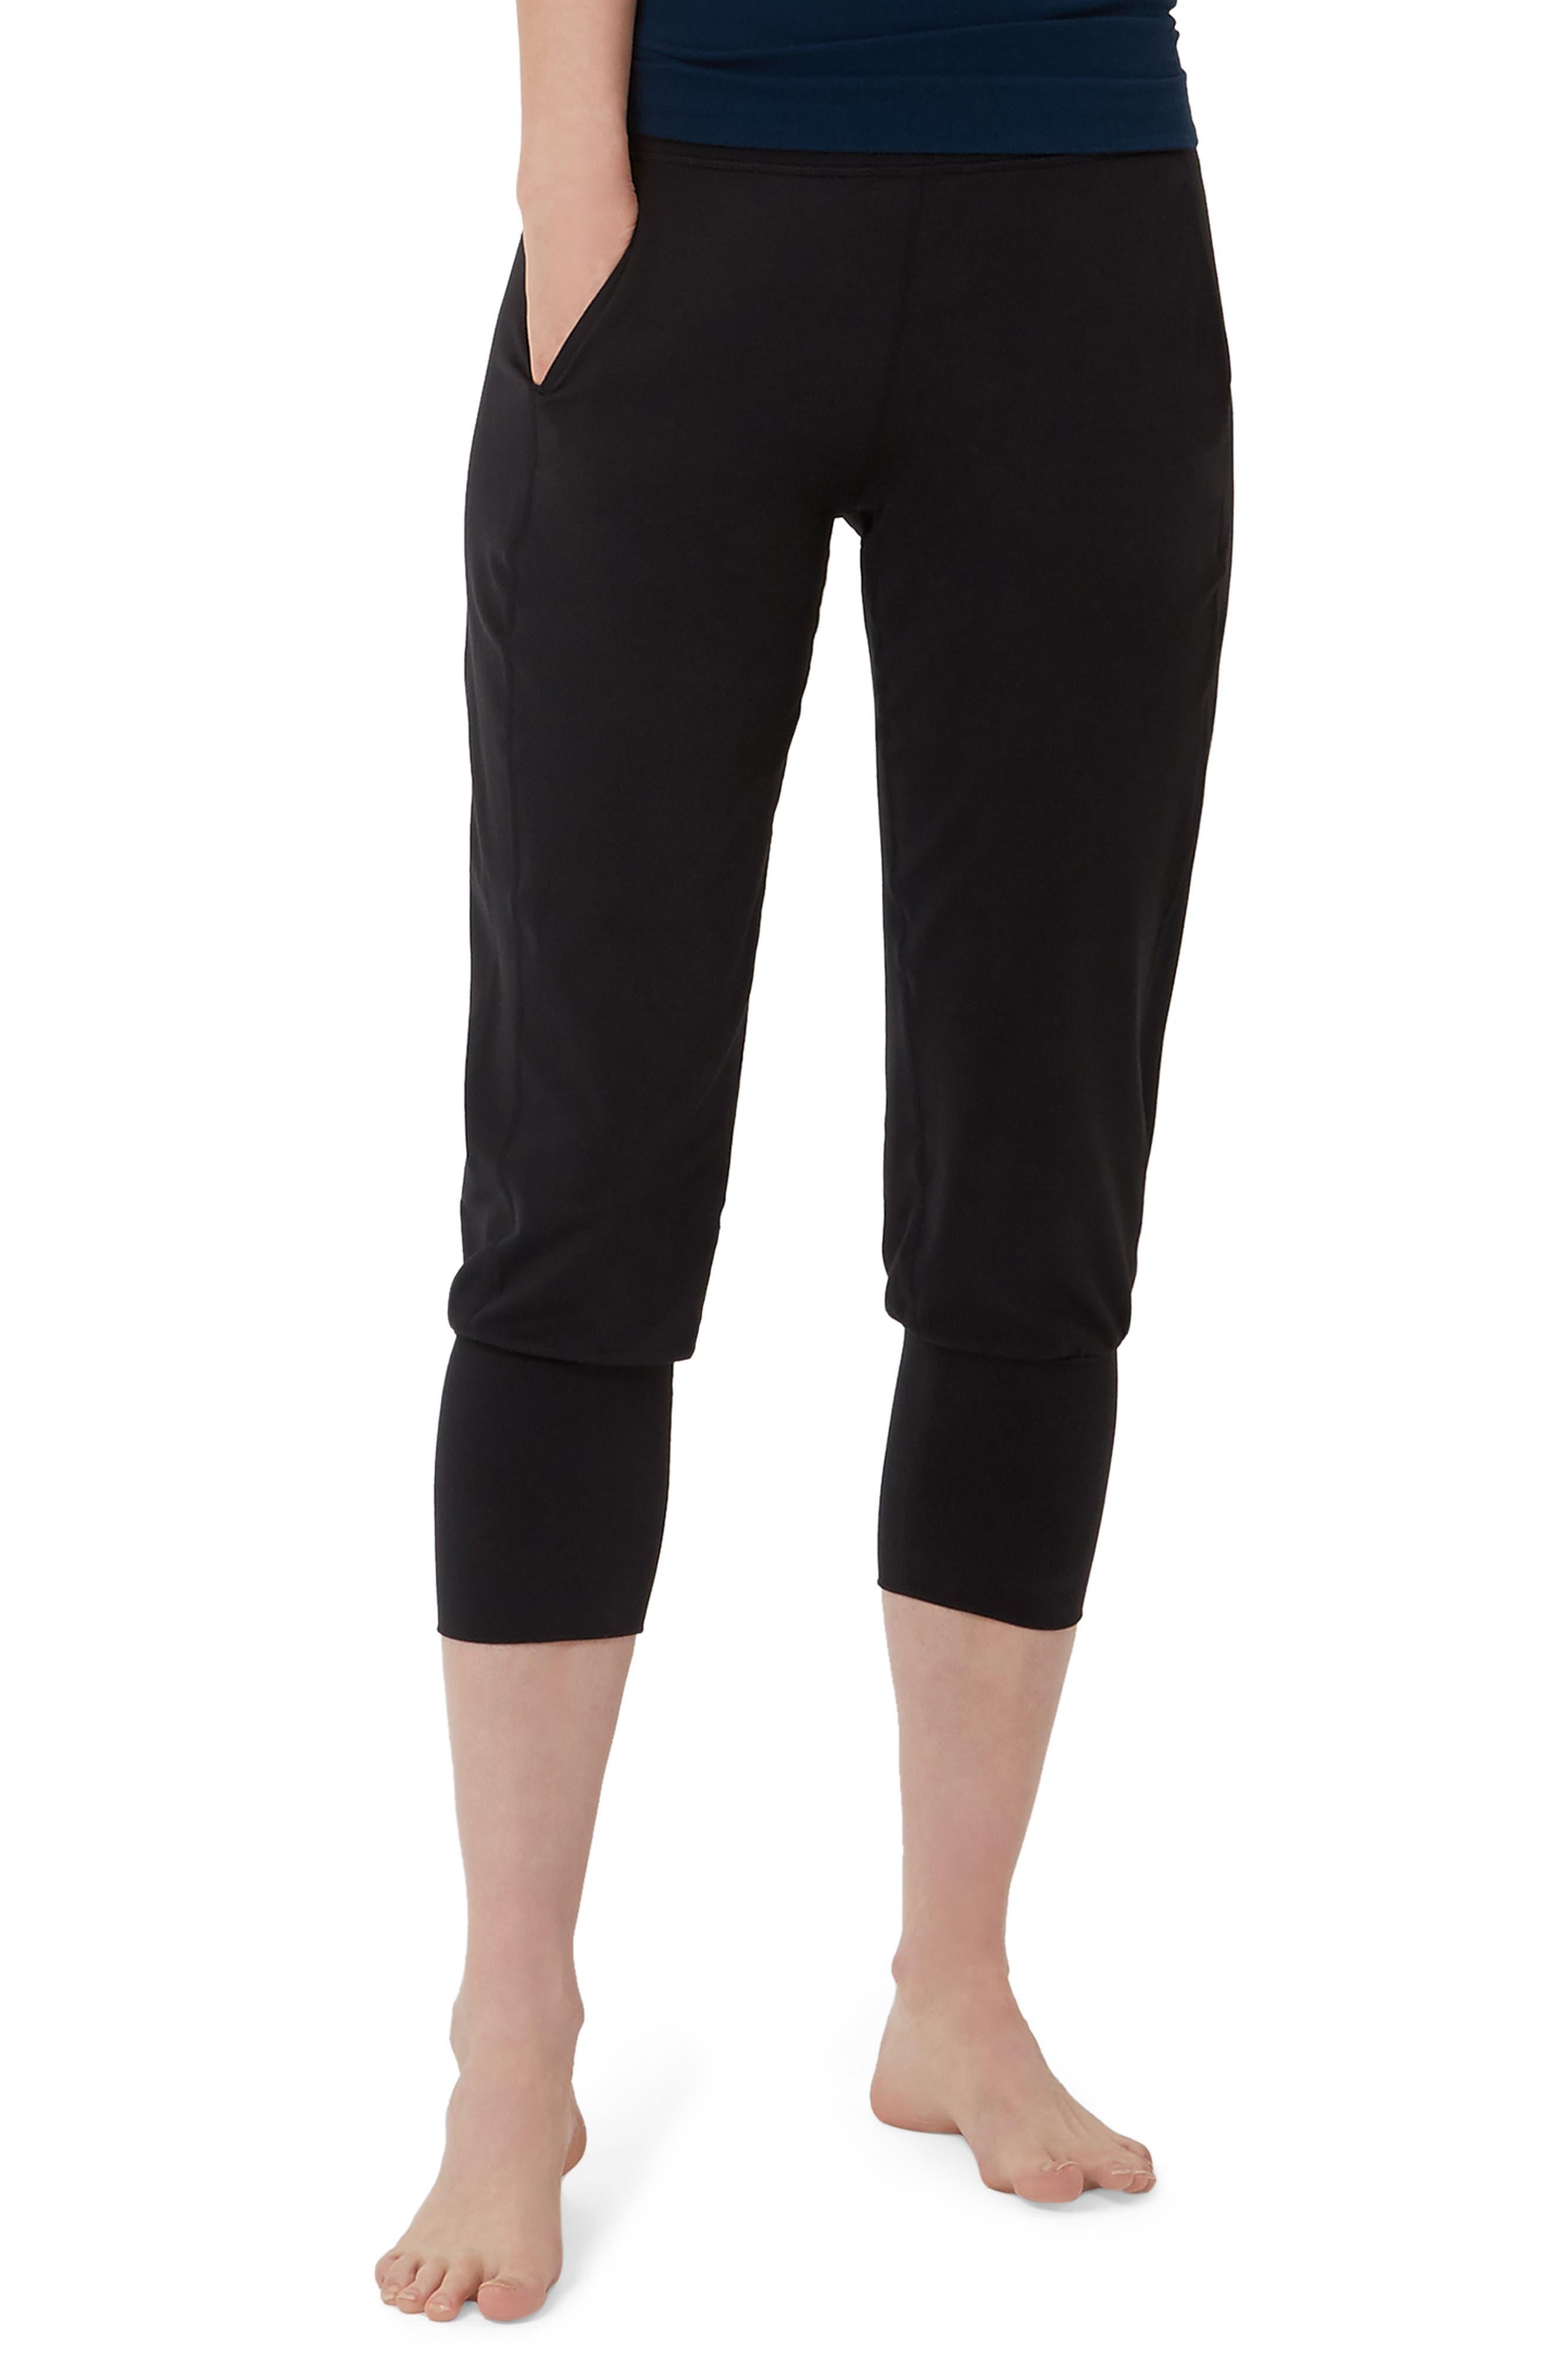 Garudasana Crop Yoga Trousers,                             Main thumbnail 1, color,                             BLACK